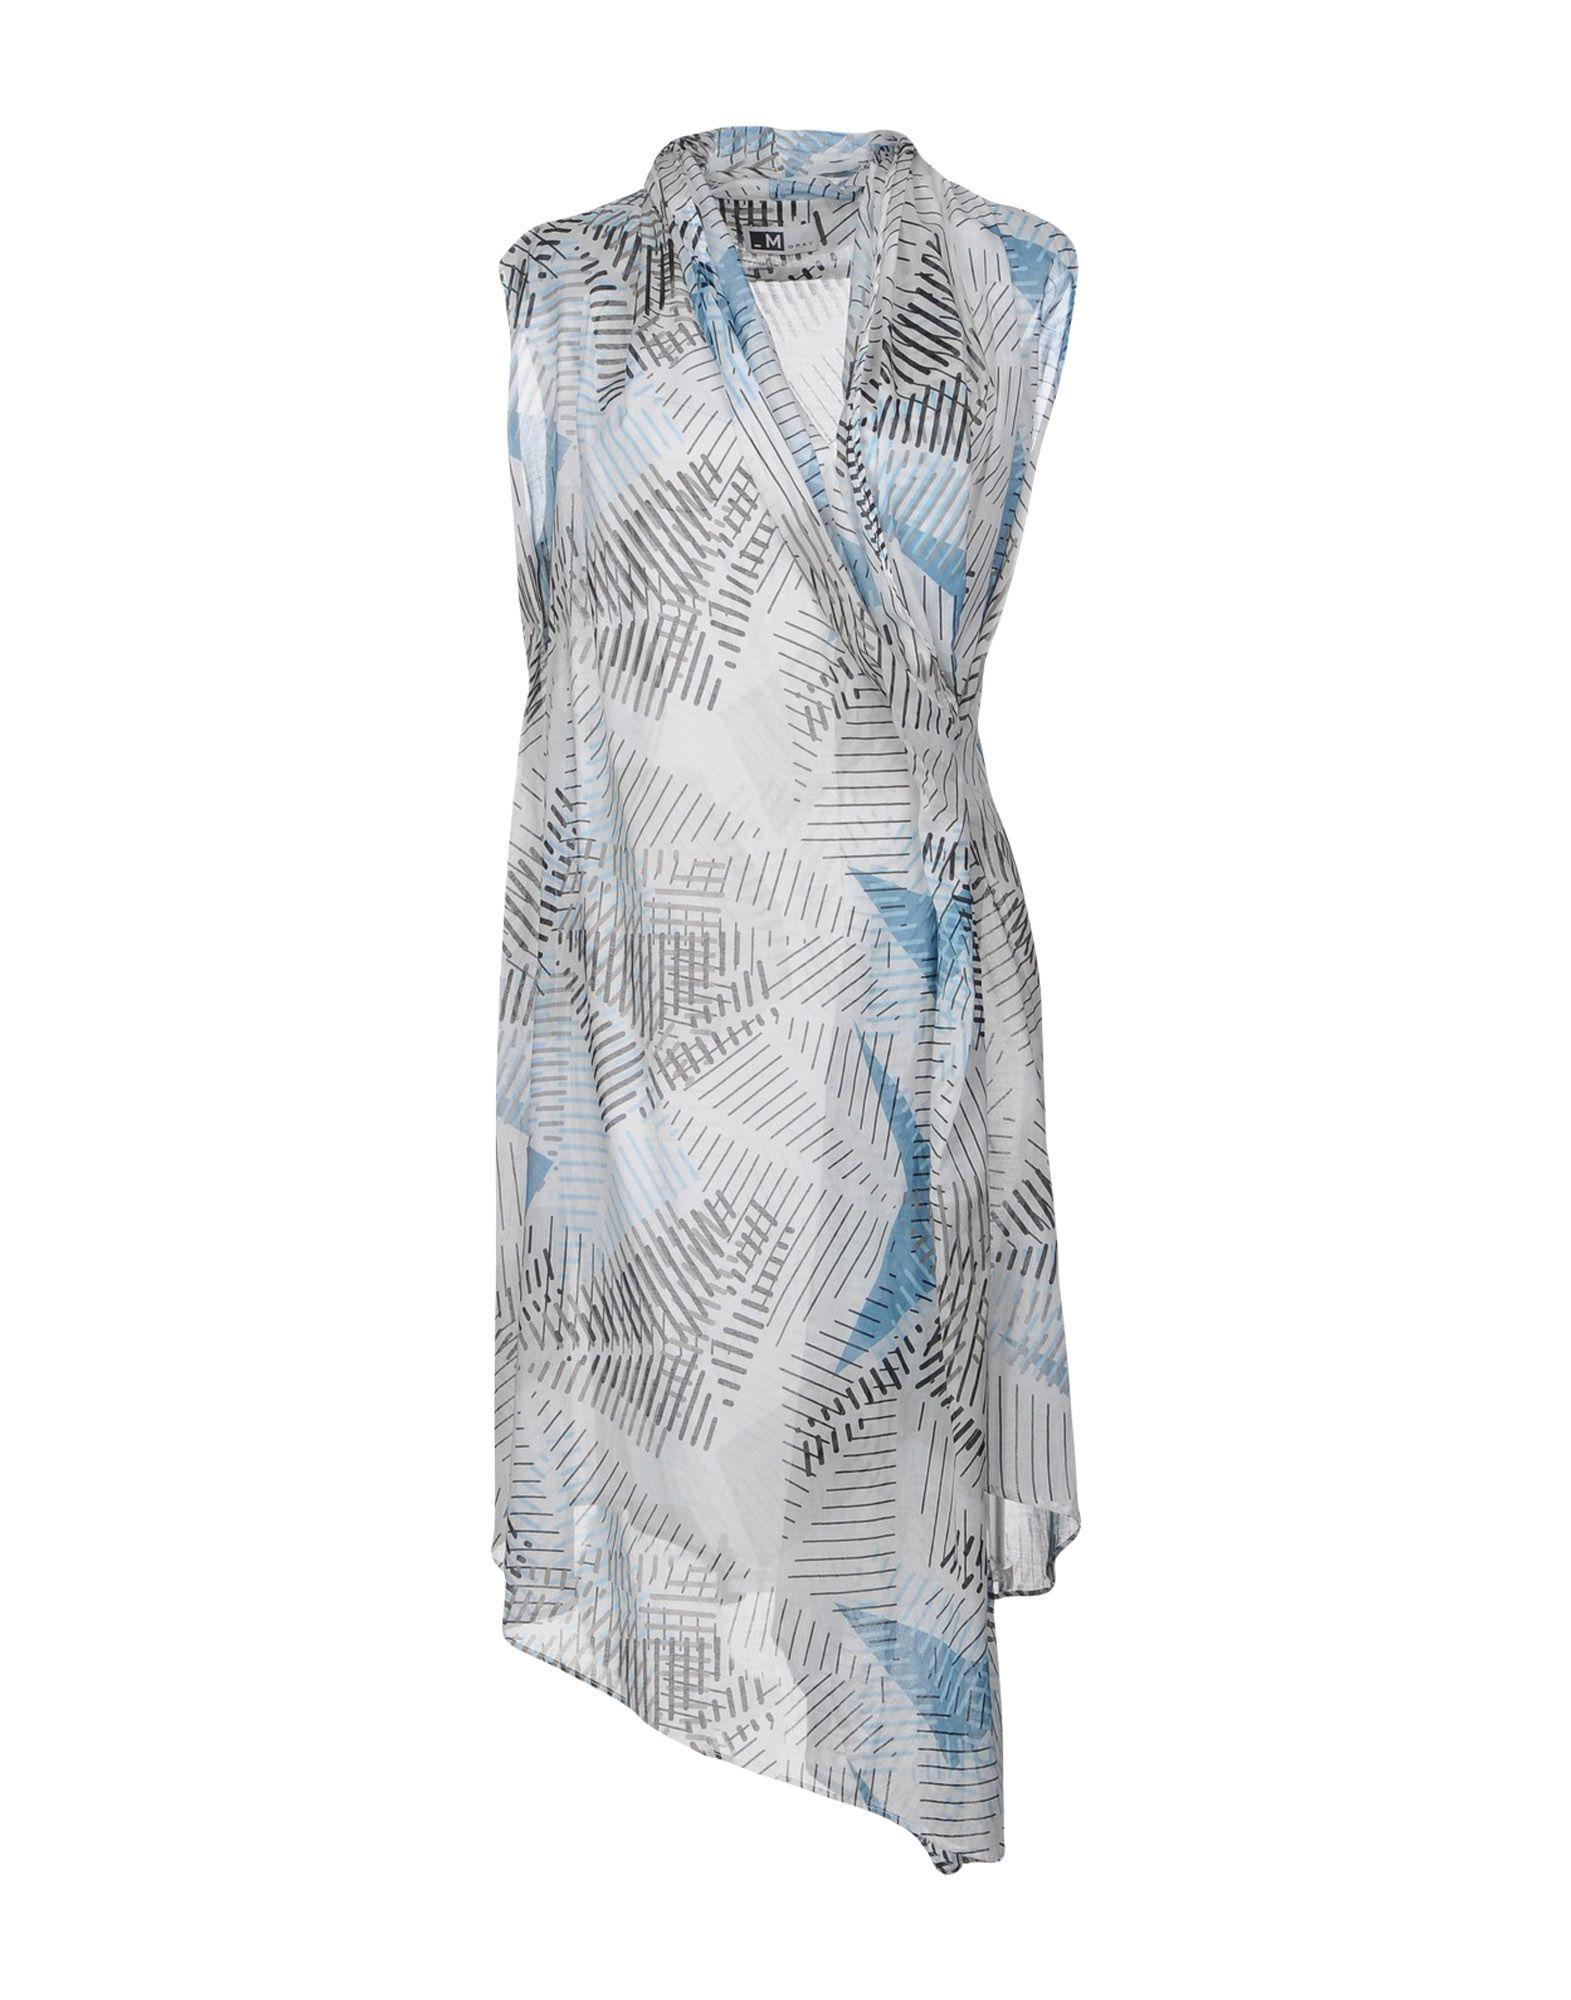 _M GRAY Платье длиной 3/4 игрушка ecx ruckus gray blue ecx00013t1